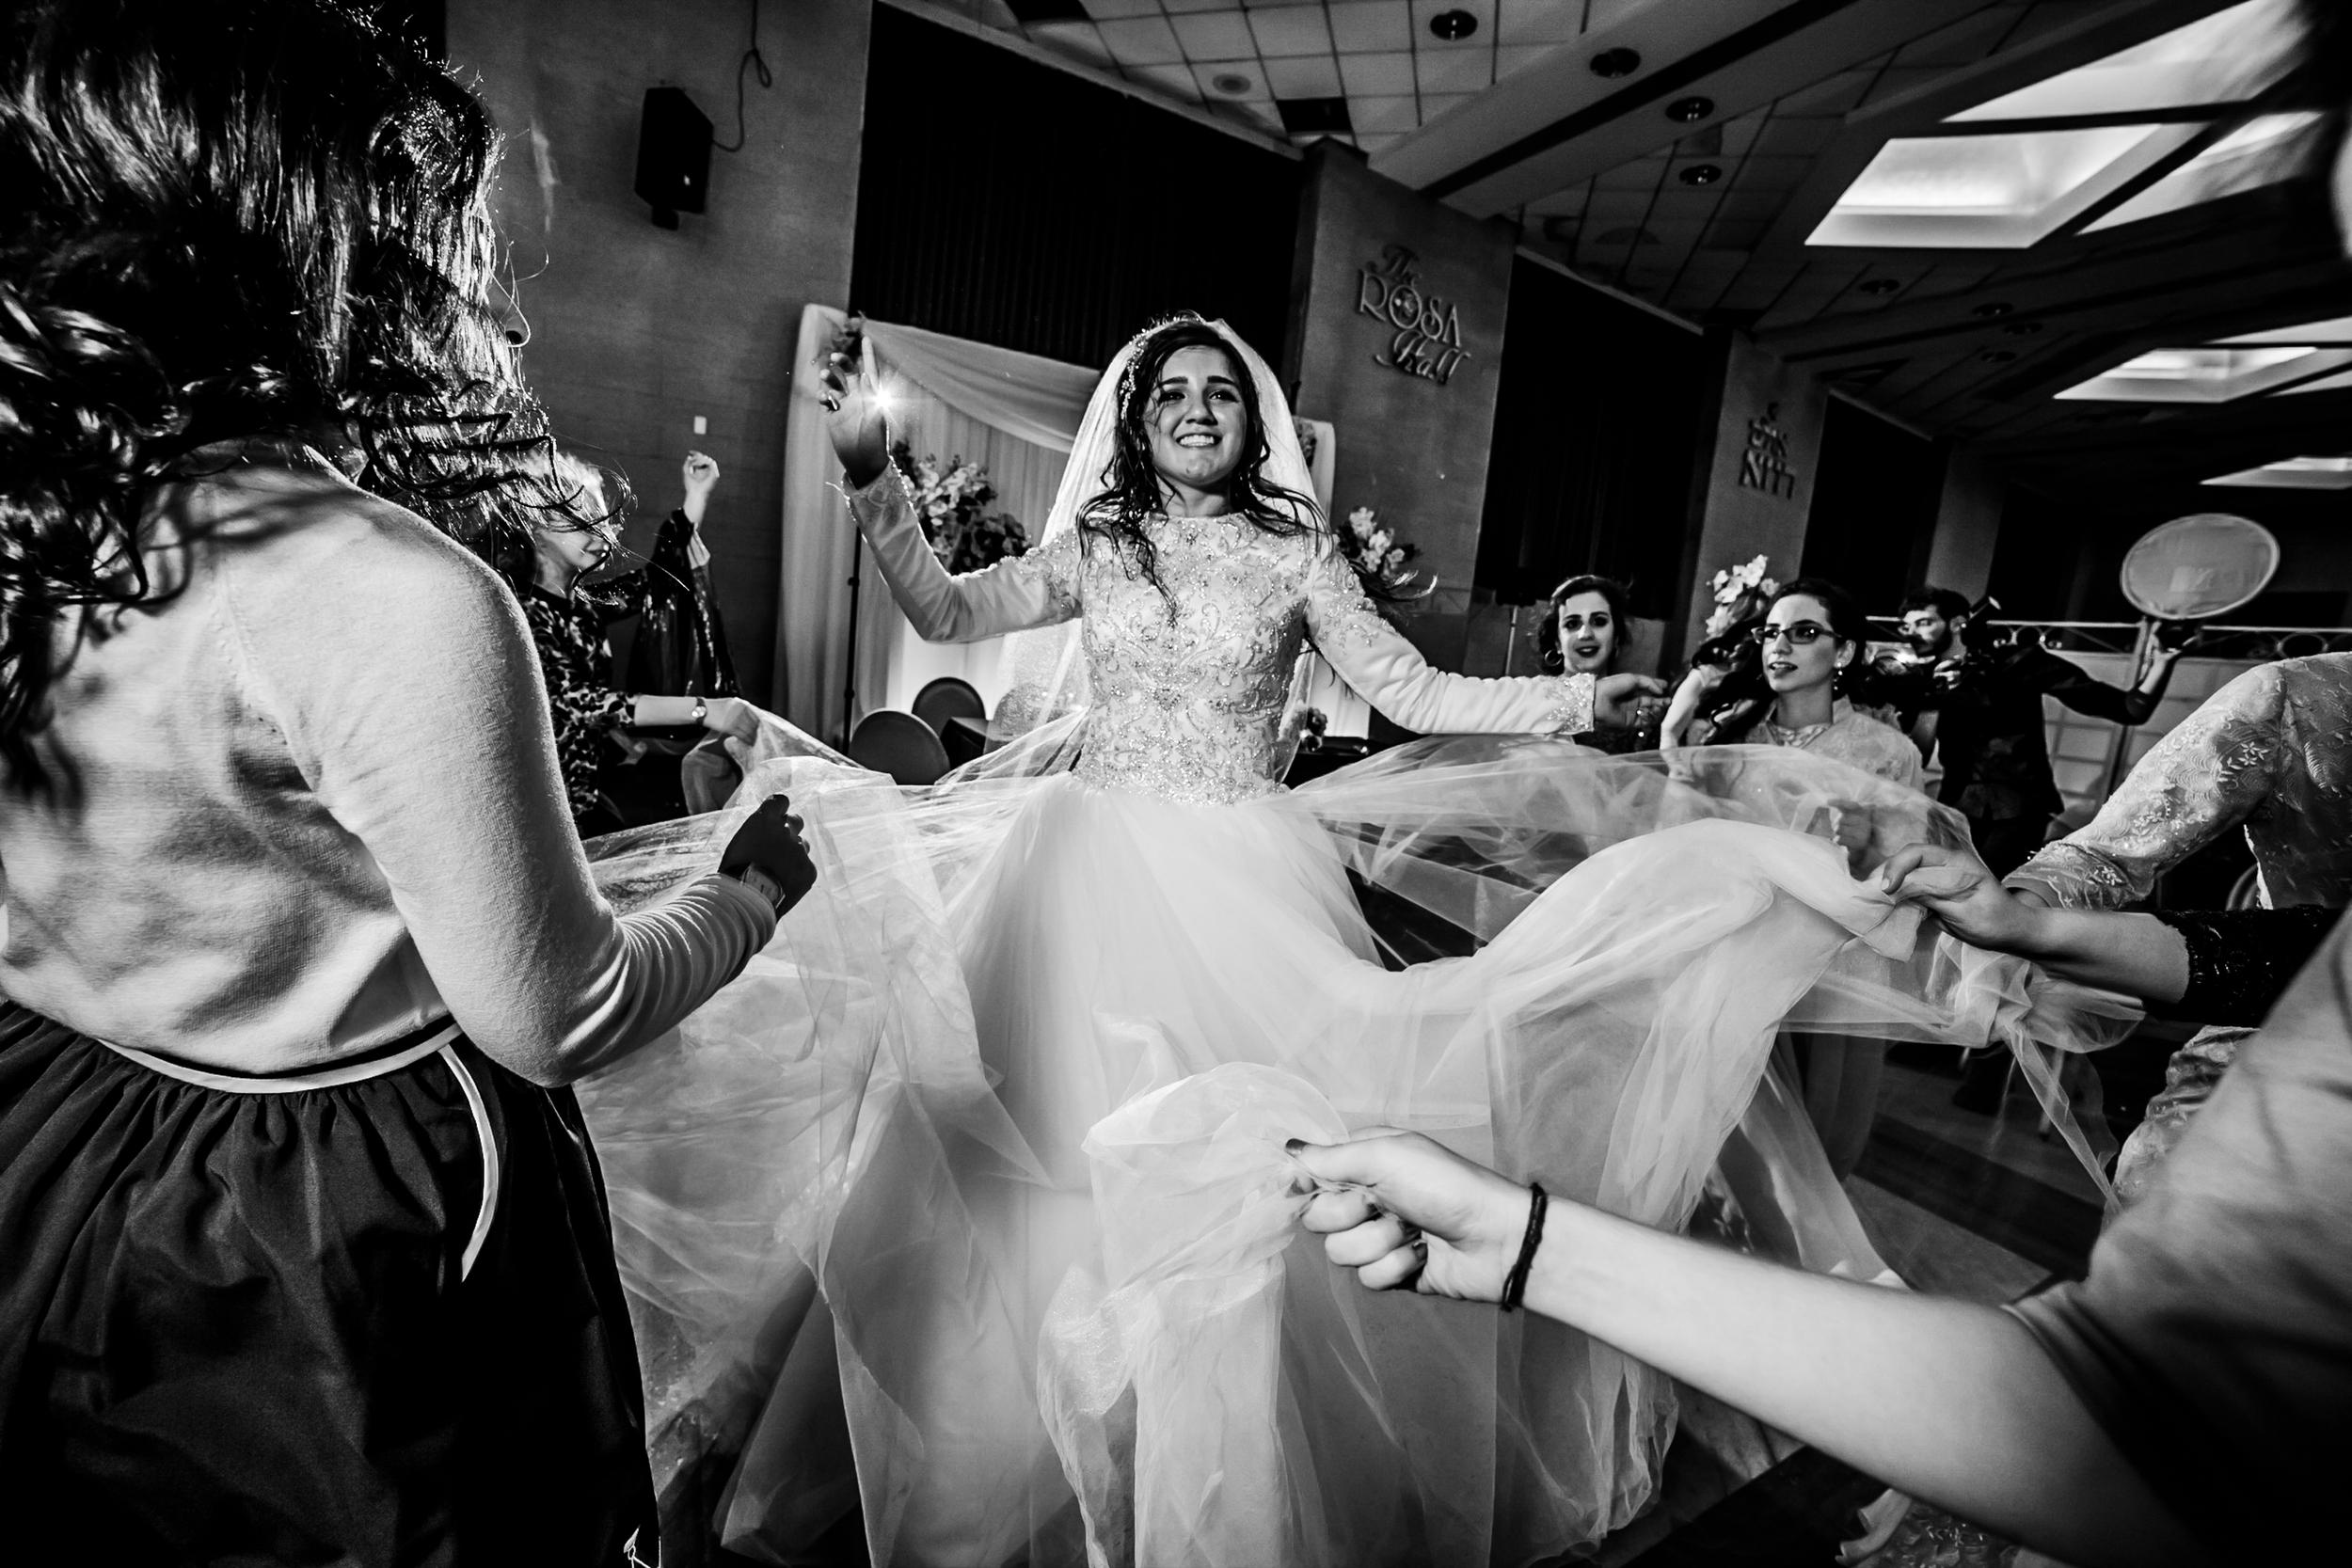 Wedding Iossi and Gitty Khafif  - Eliau Piha studio photography, new york, events, people 770 brooklyn -1281.jpg